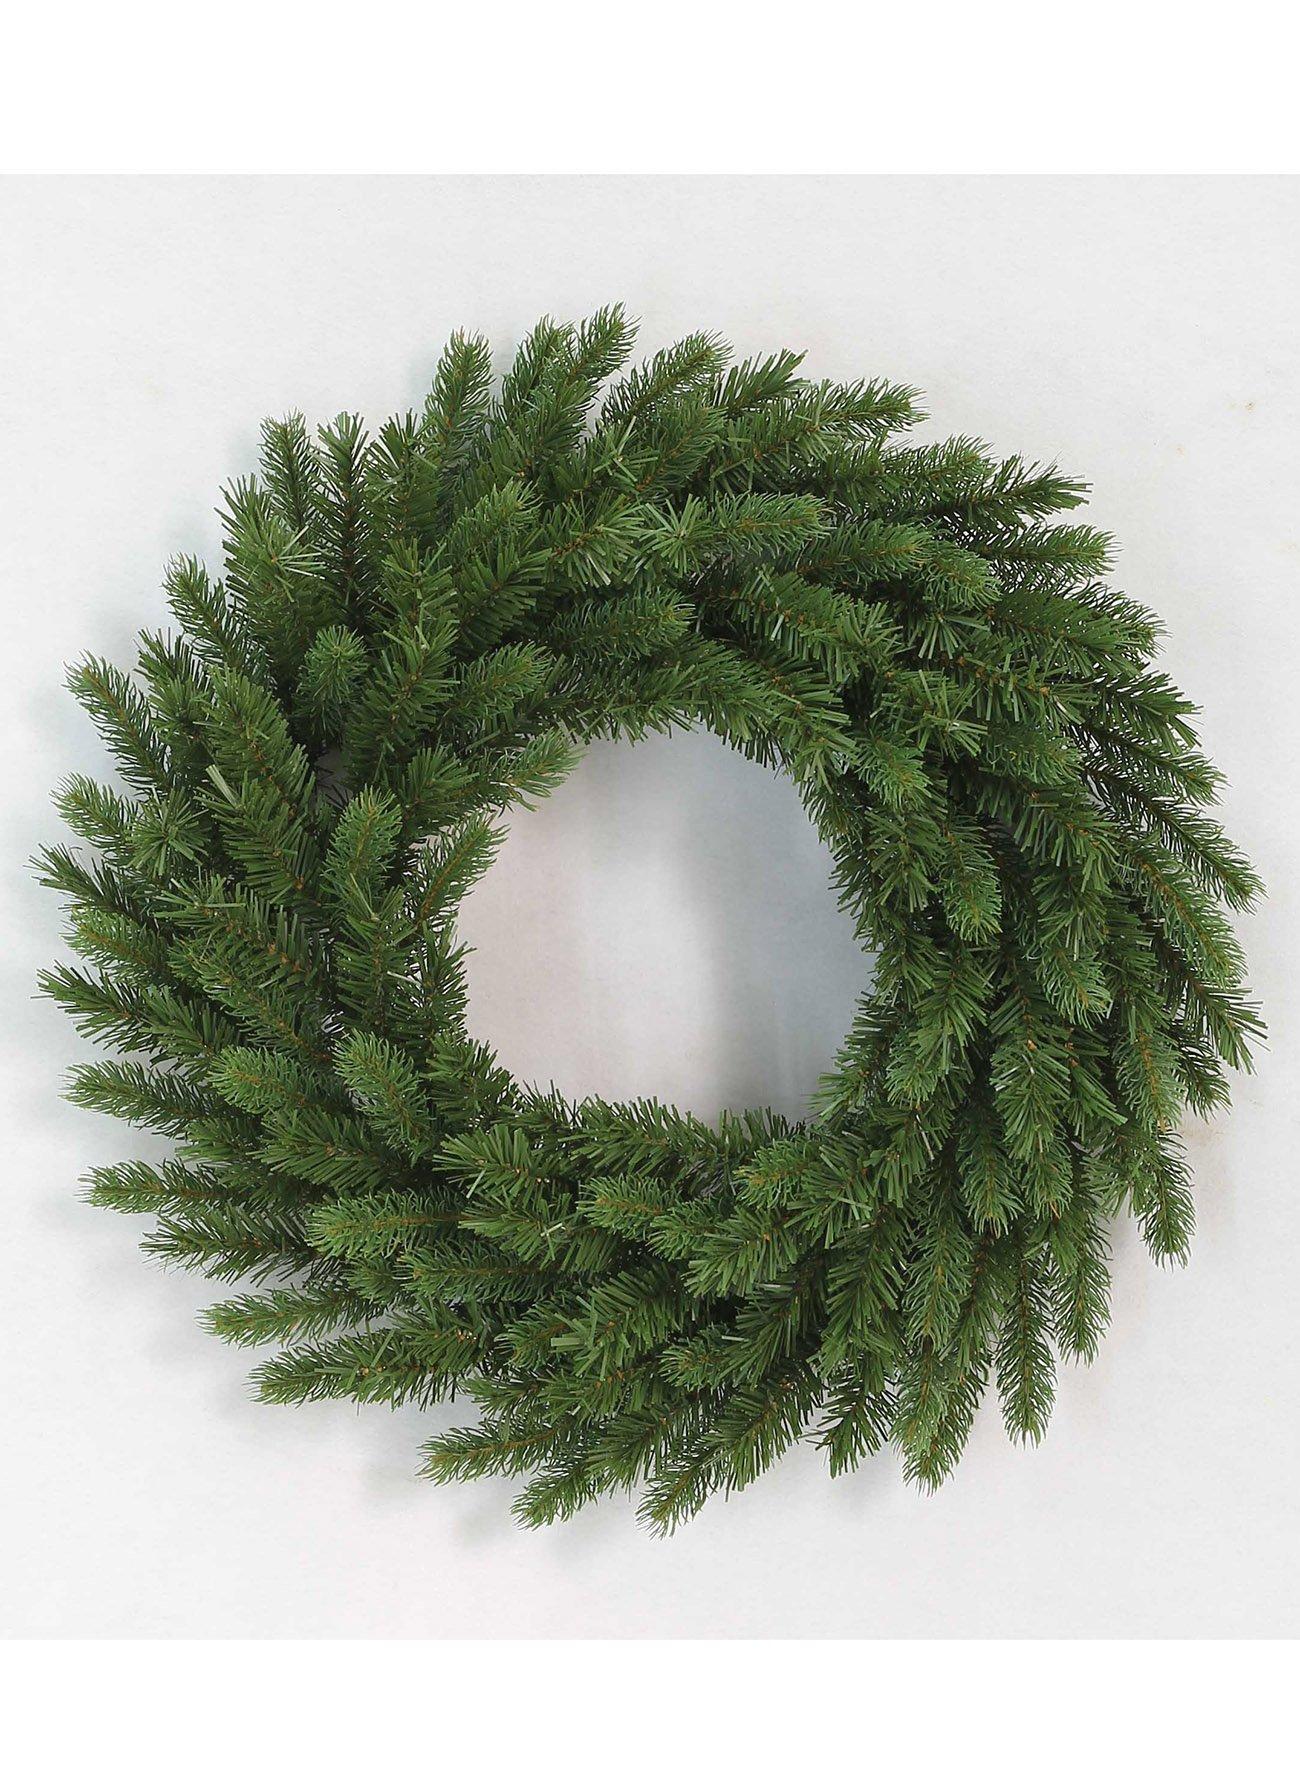 KING OF CHRISTMAS 36″ King Fraser Fir Wreath With 150 LED Lights